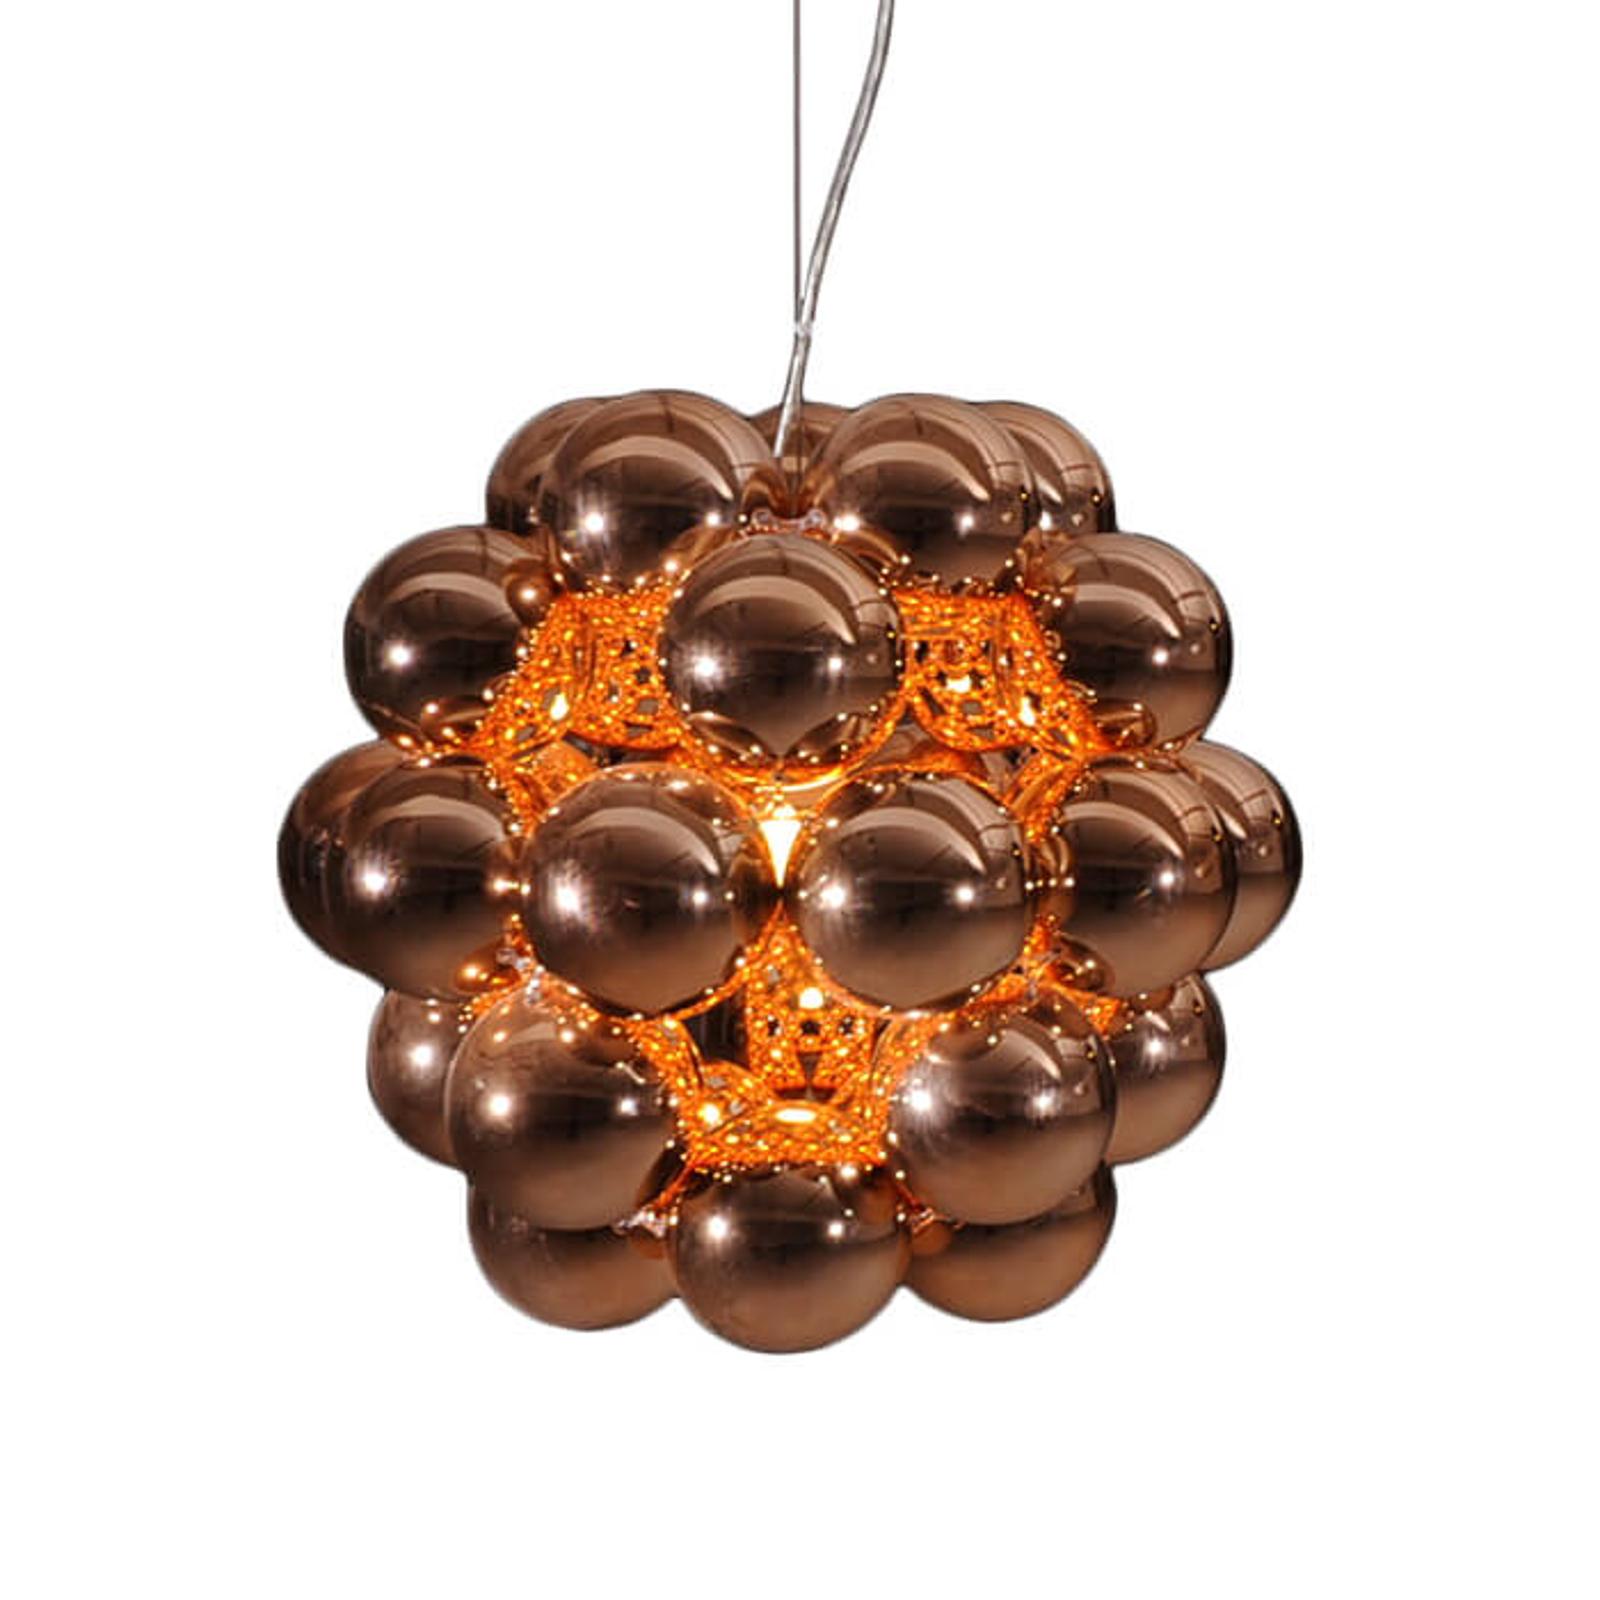 Innermost Beads Penta - hængelampe i kobber